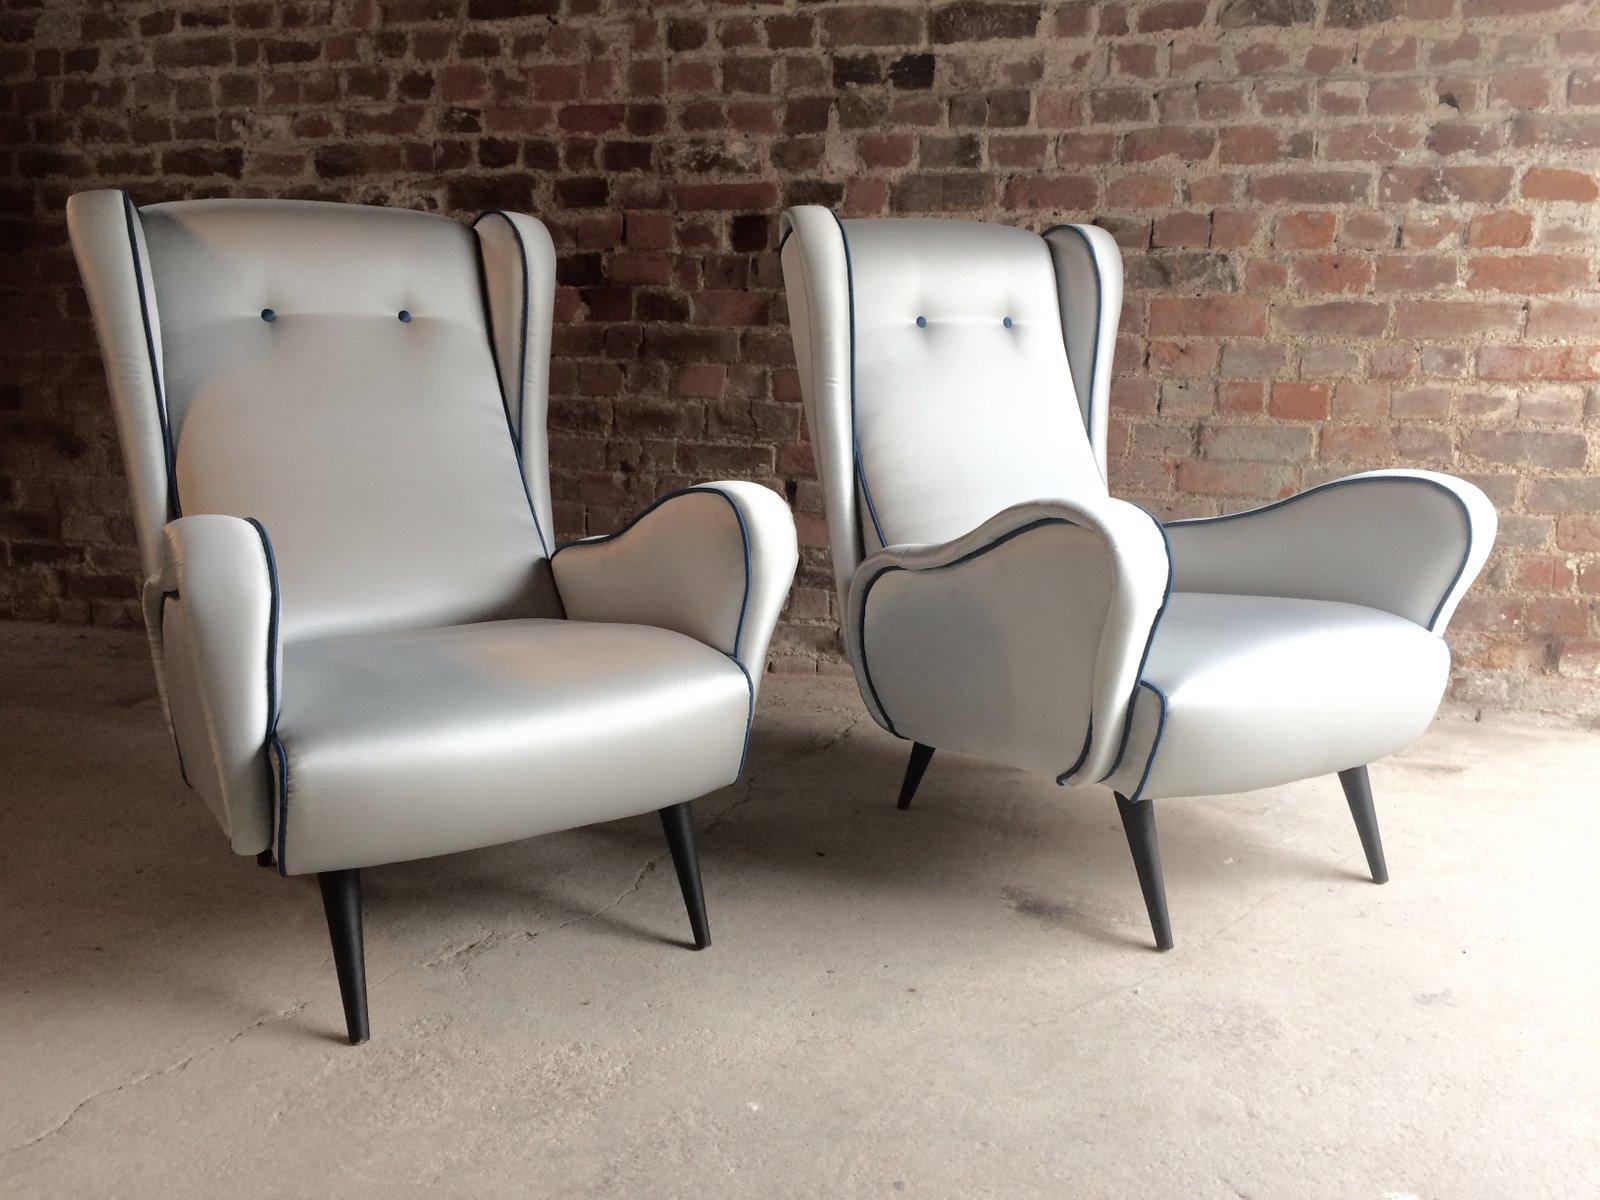 italienische mid century sessel 1950er 2er set bei. Black Bedroom Furniture Sets. Home Design Ideas